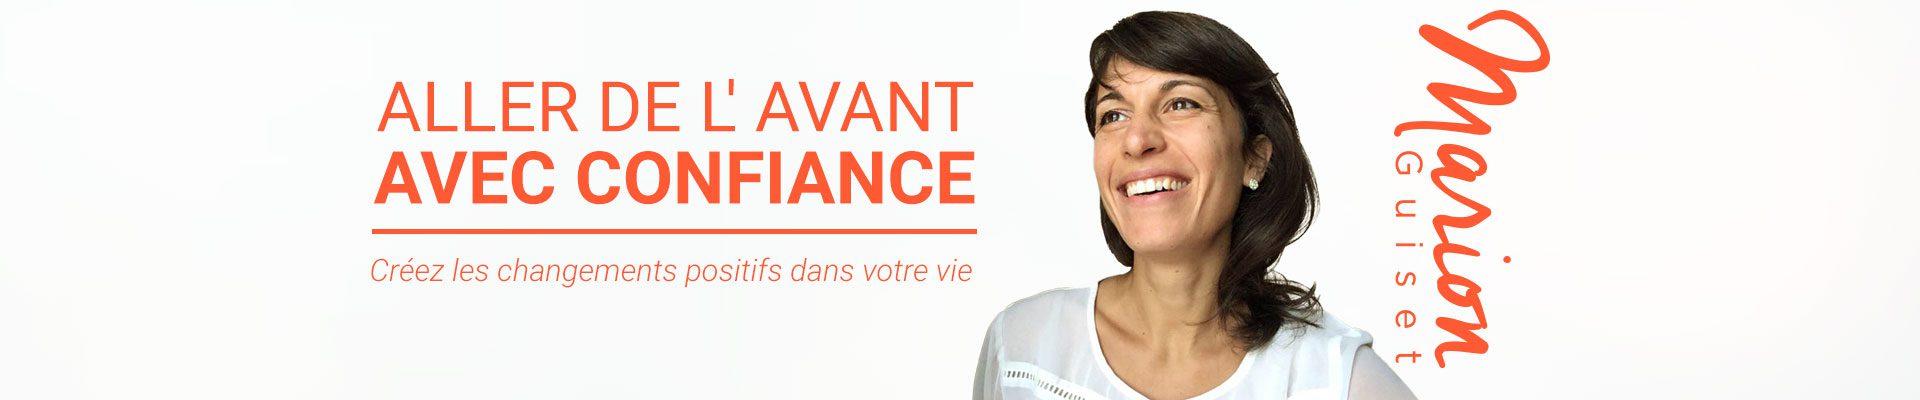 banniere_fr_marion_guiset